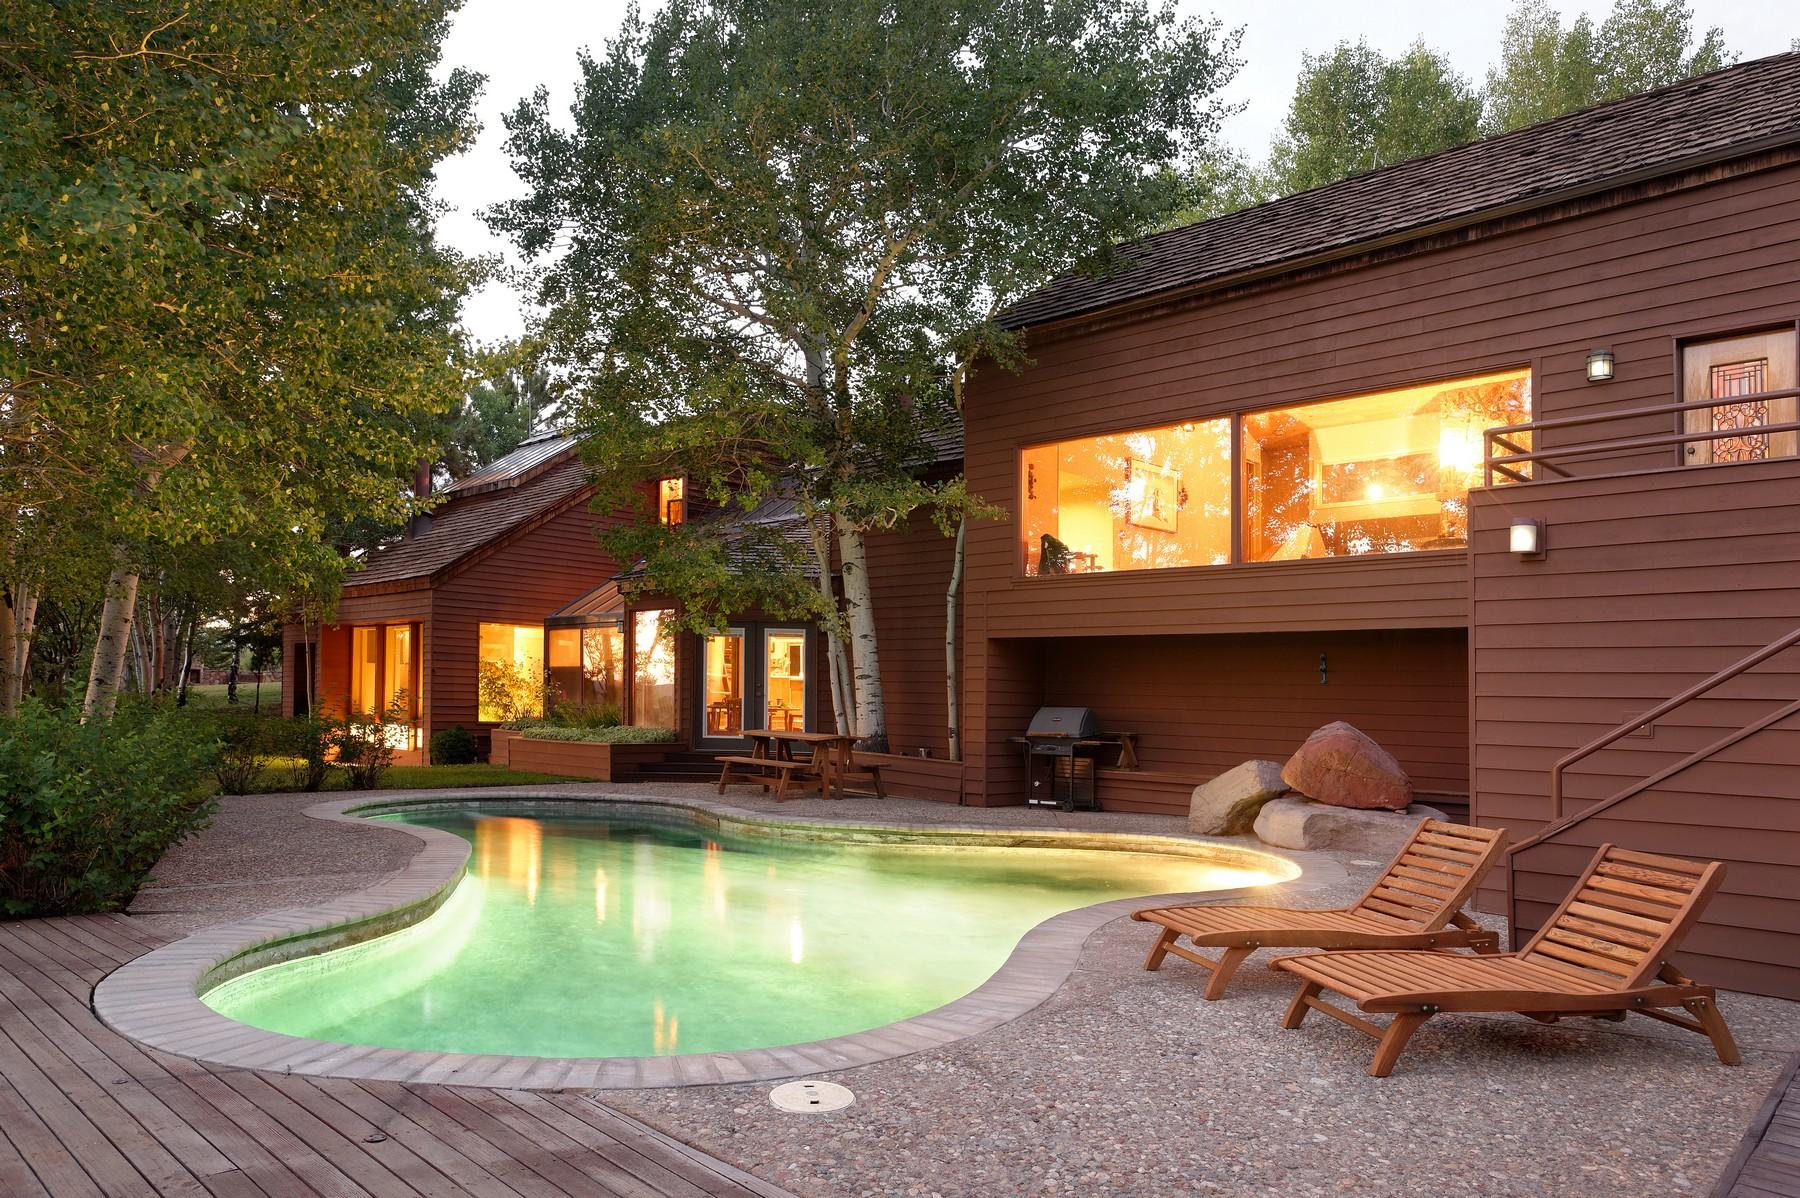 Casa para uma família para Venda às ROCKY MOUNTAIN HIGH 570 JOHNSON DRIVE Aspen, Colorado 81611 Estados Unidos